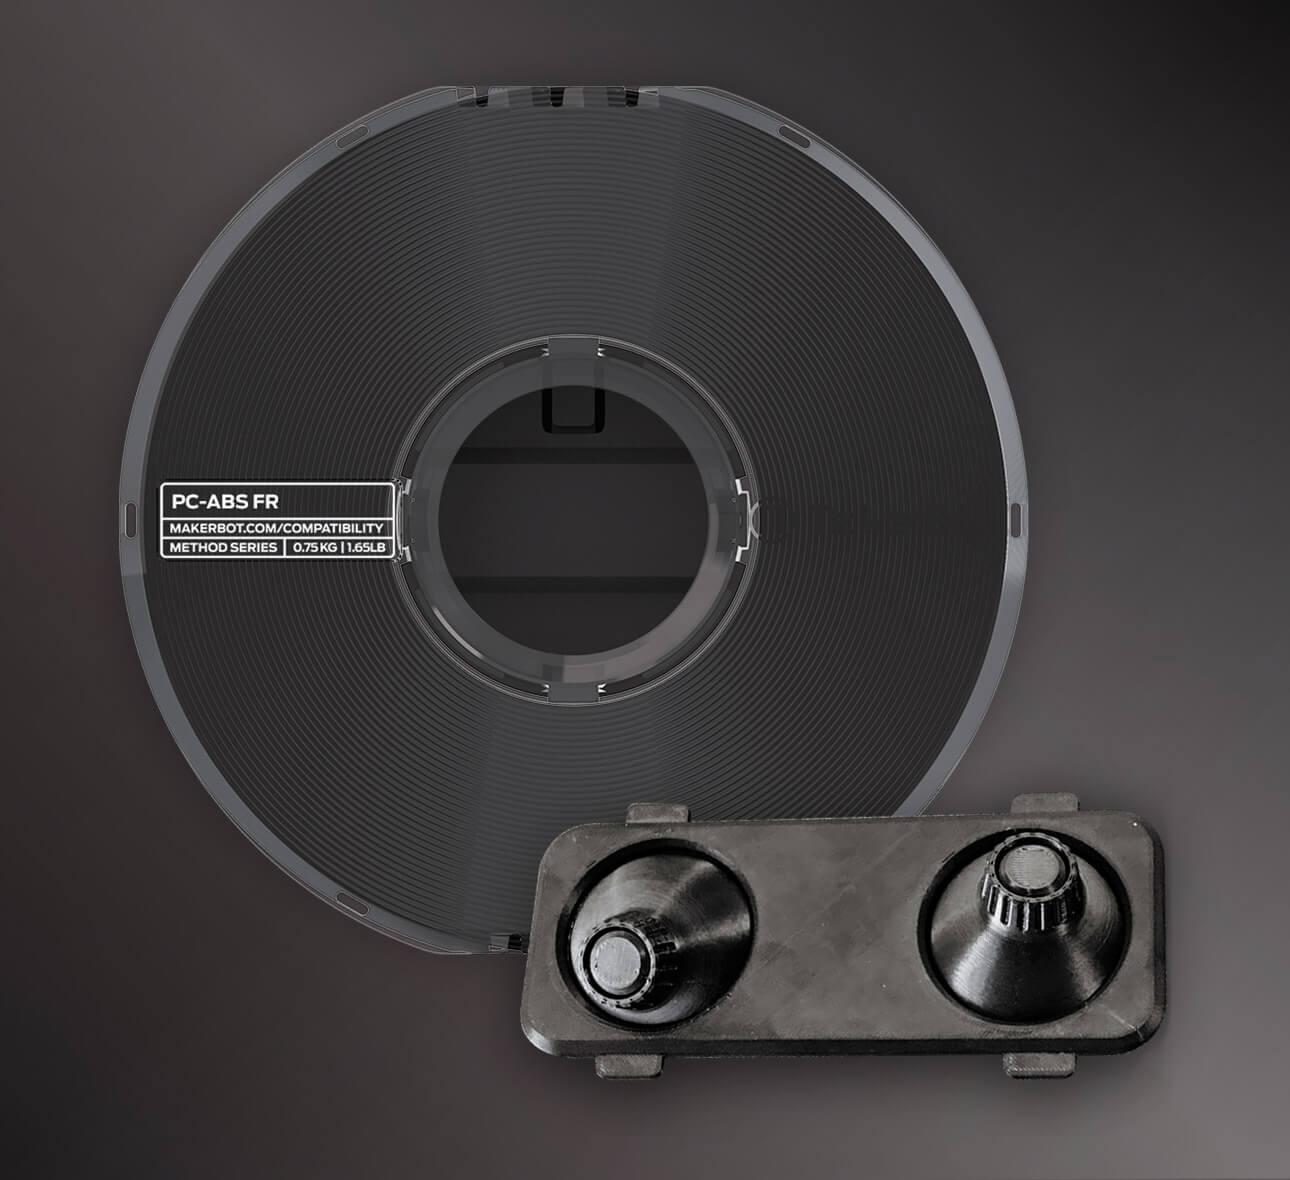 Imprimir PC-ABS & PC-ABS Fire retardant